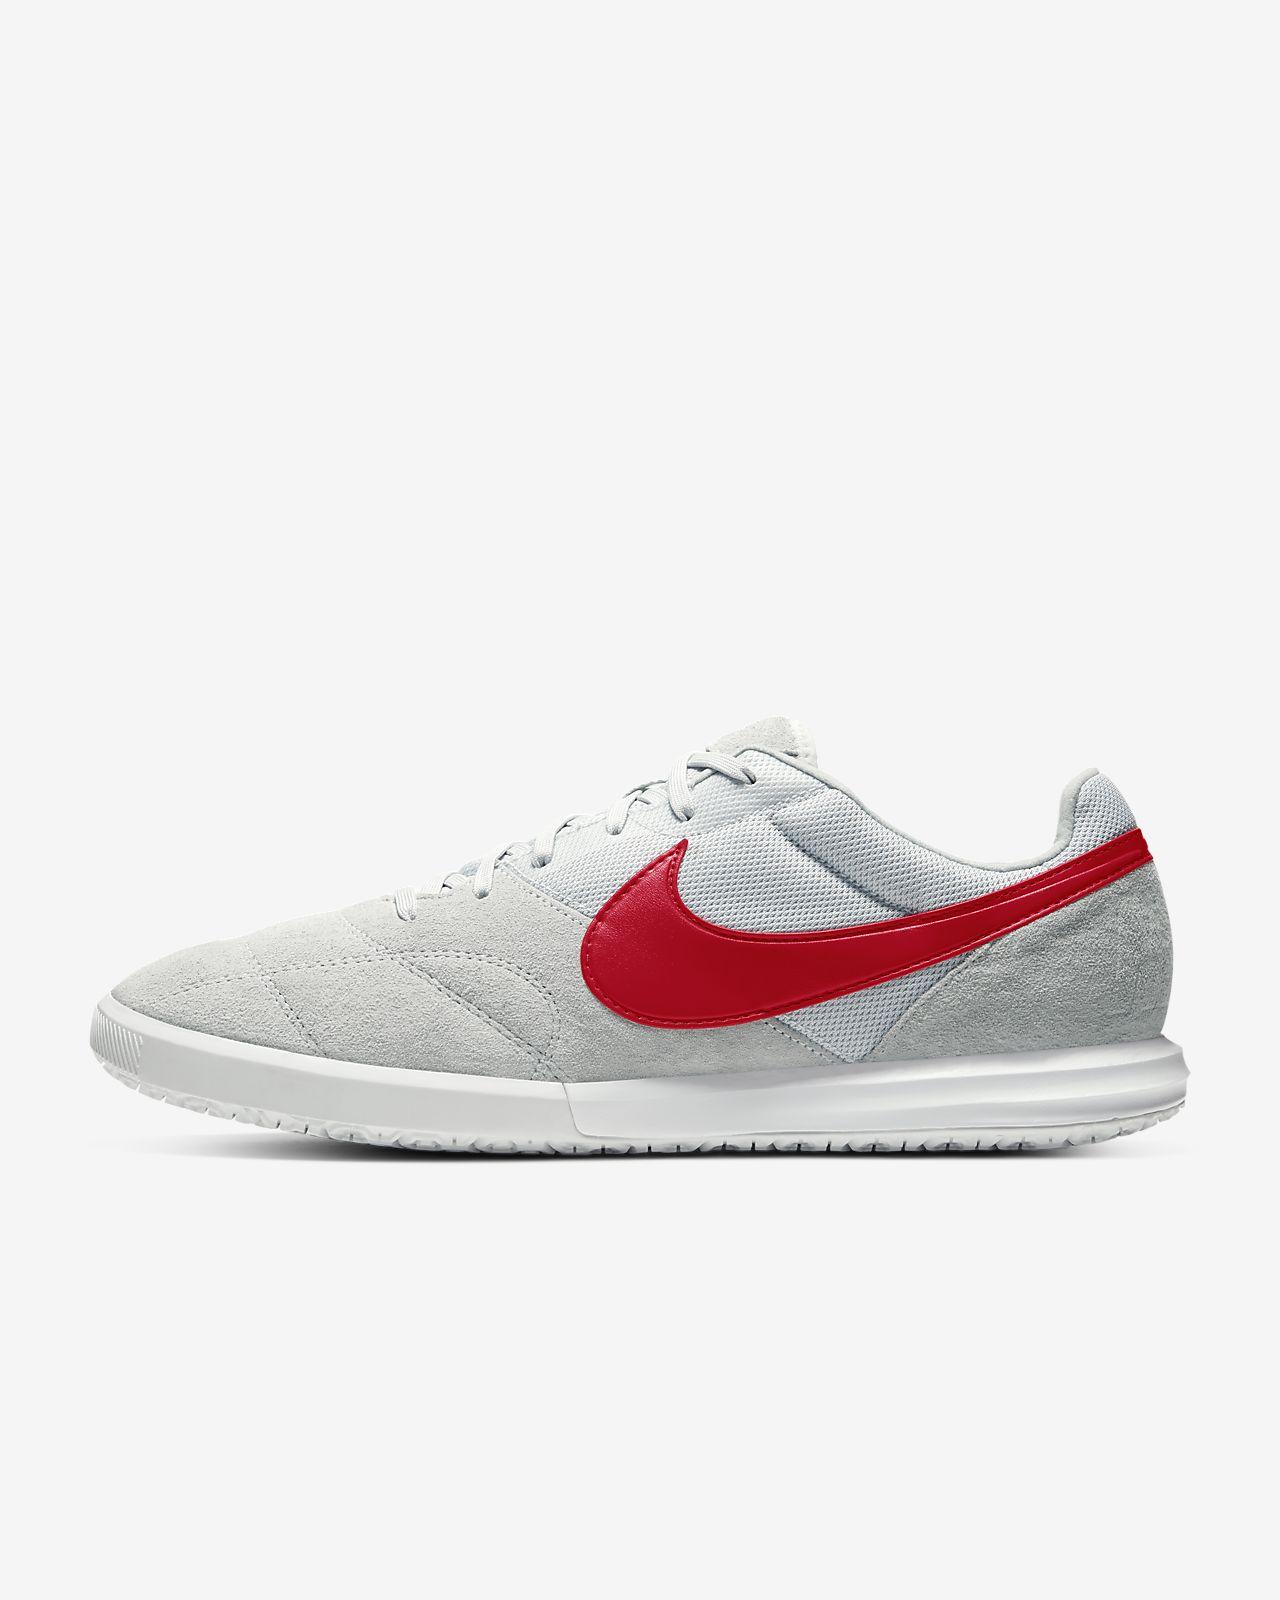 Nike Premier II Sala | Fútbol | Zapatillas de futbol sala